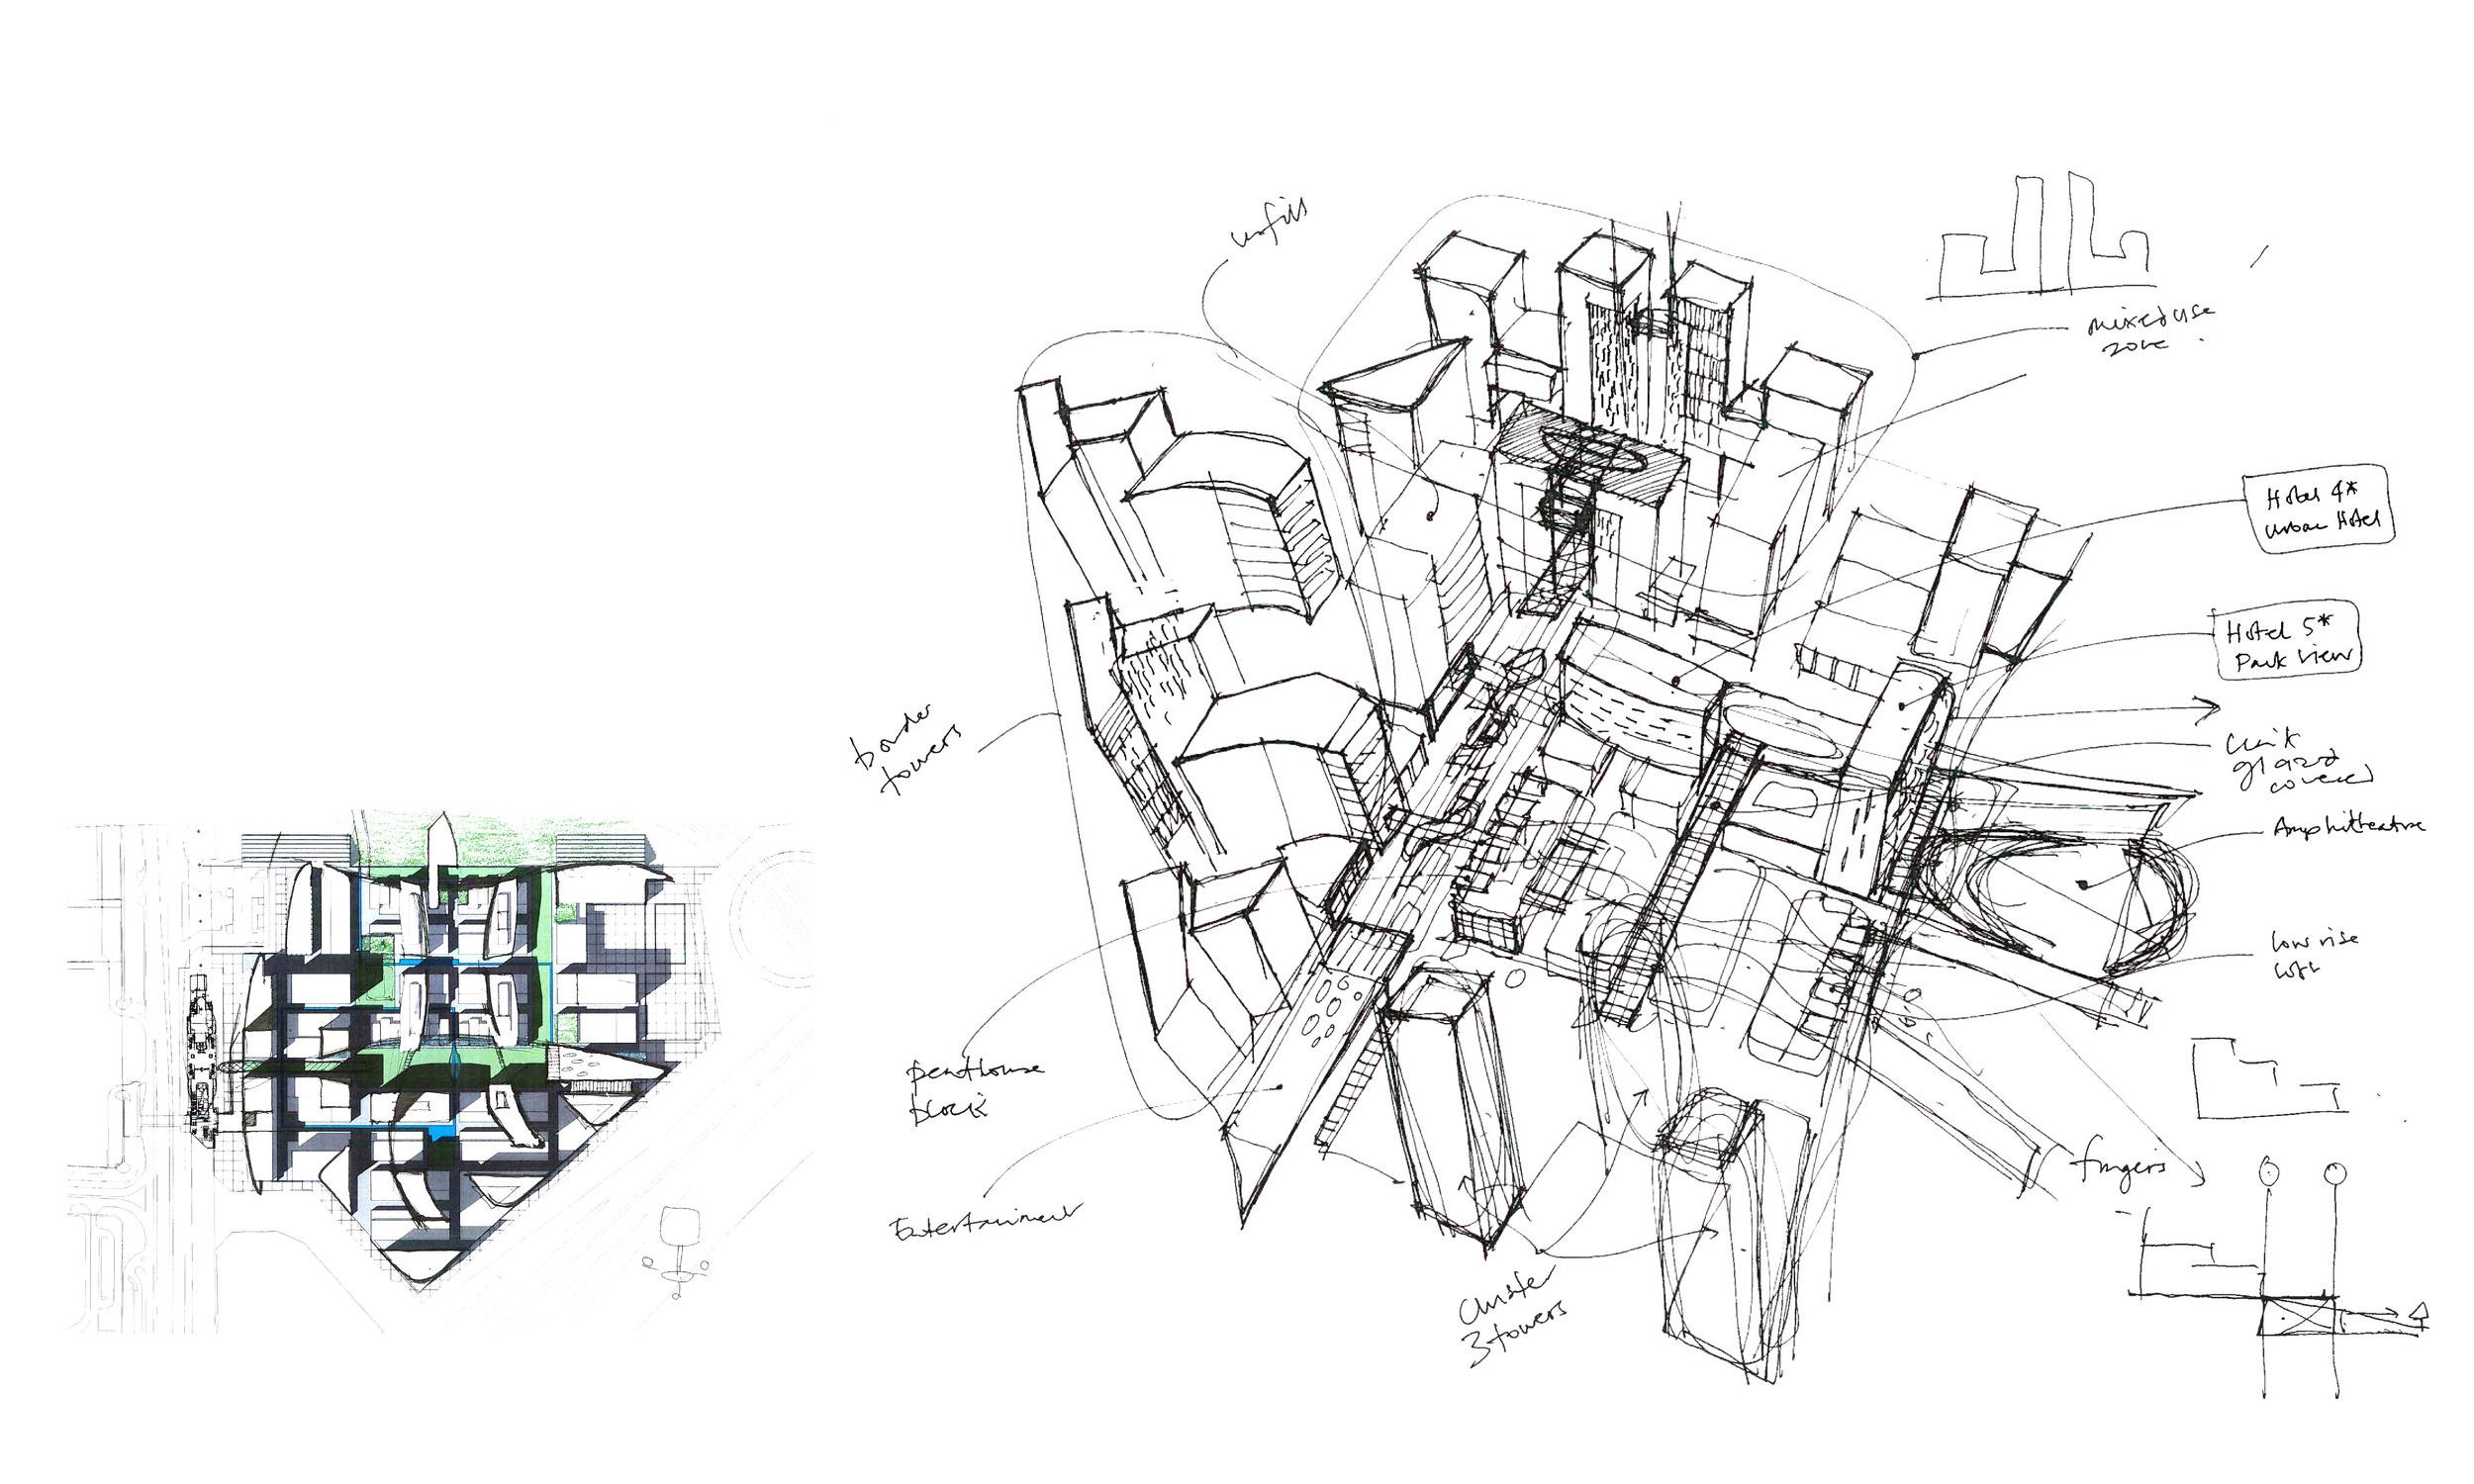 4.+District+49_Master+Plan+Report_Feb2009+94+copy.jpg